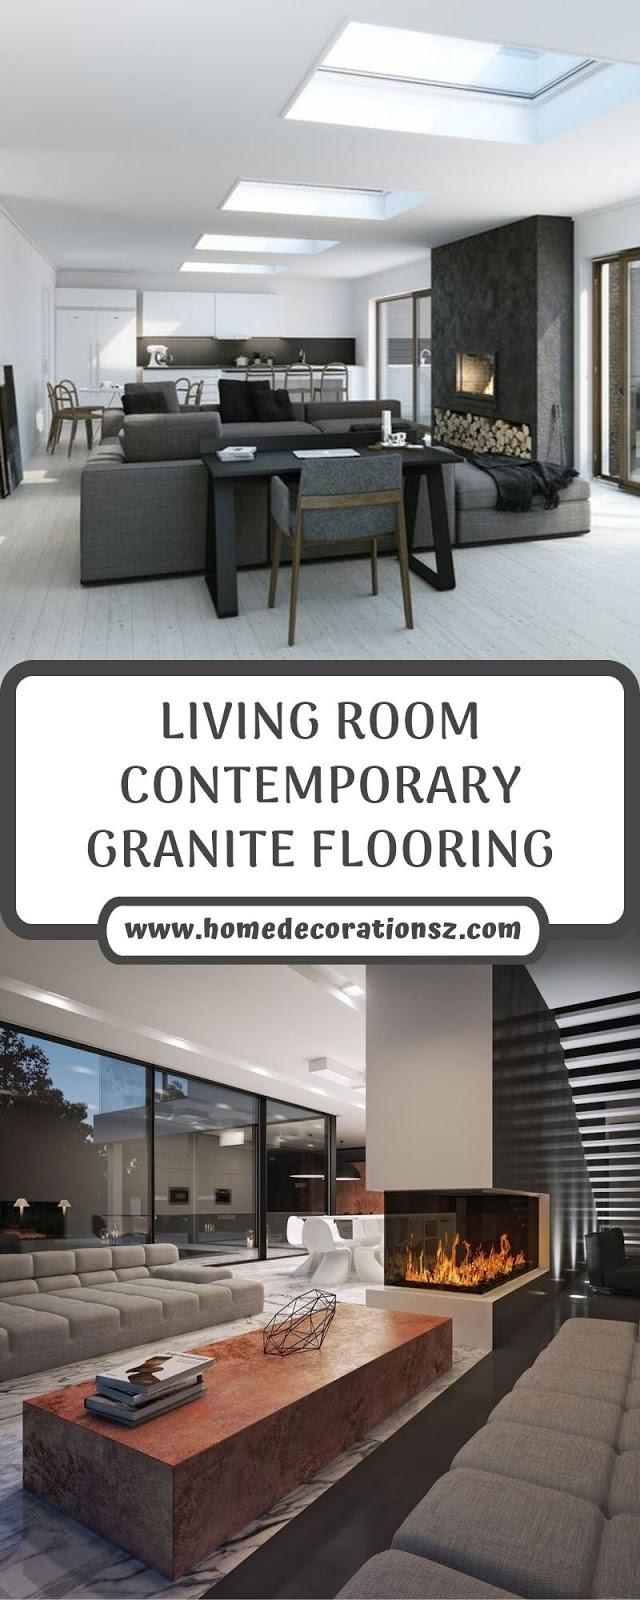 LIVING ROOM CONTEMPORARY GRANITE FLOORING